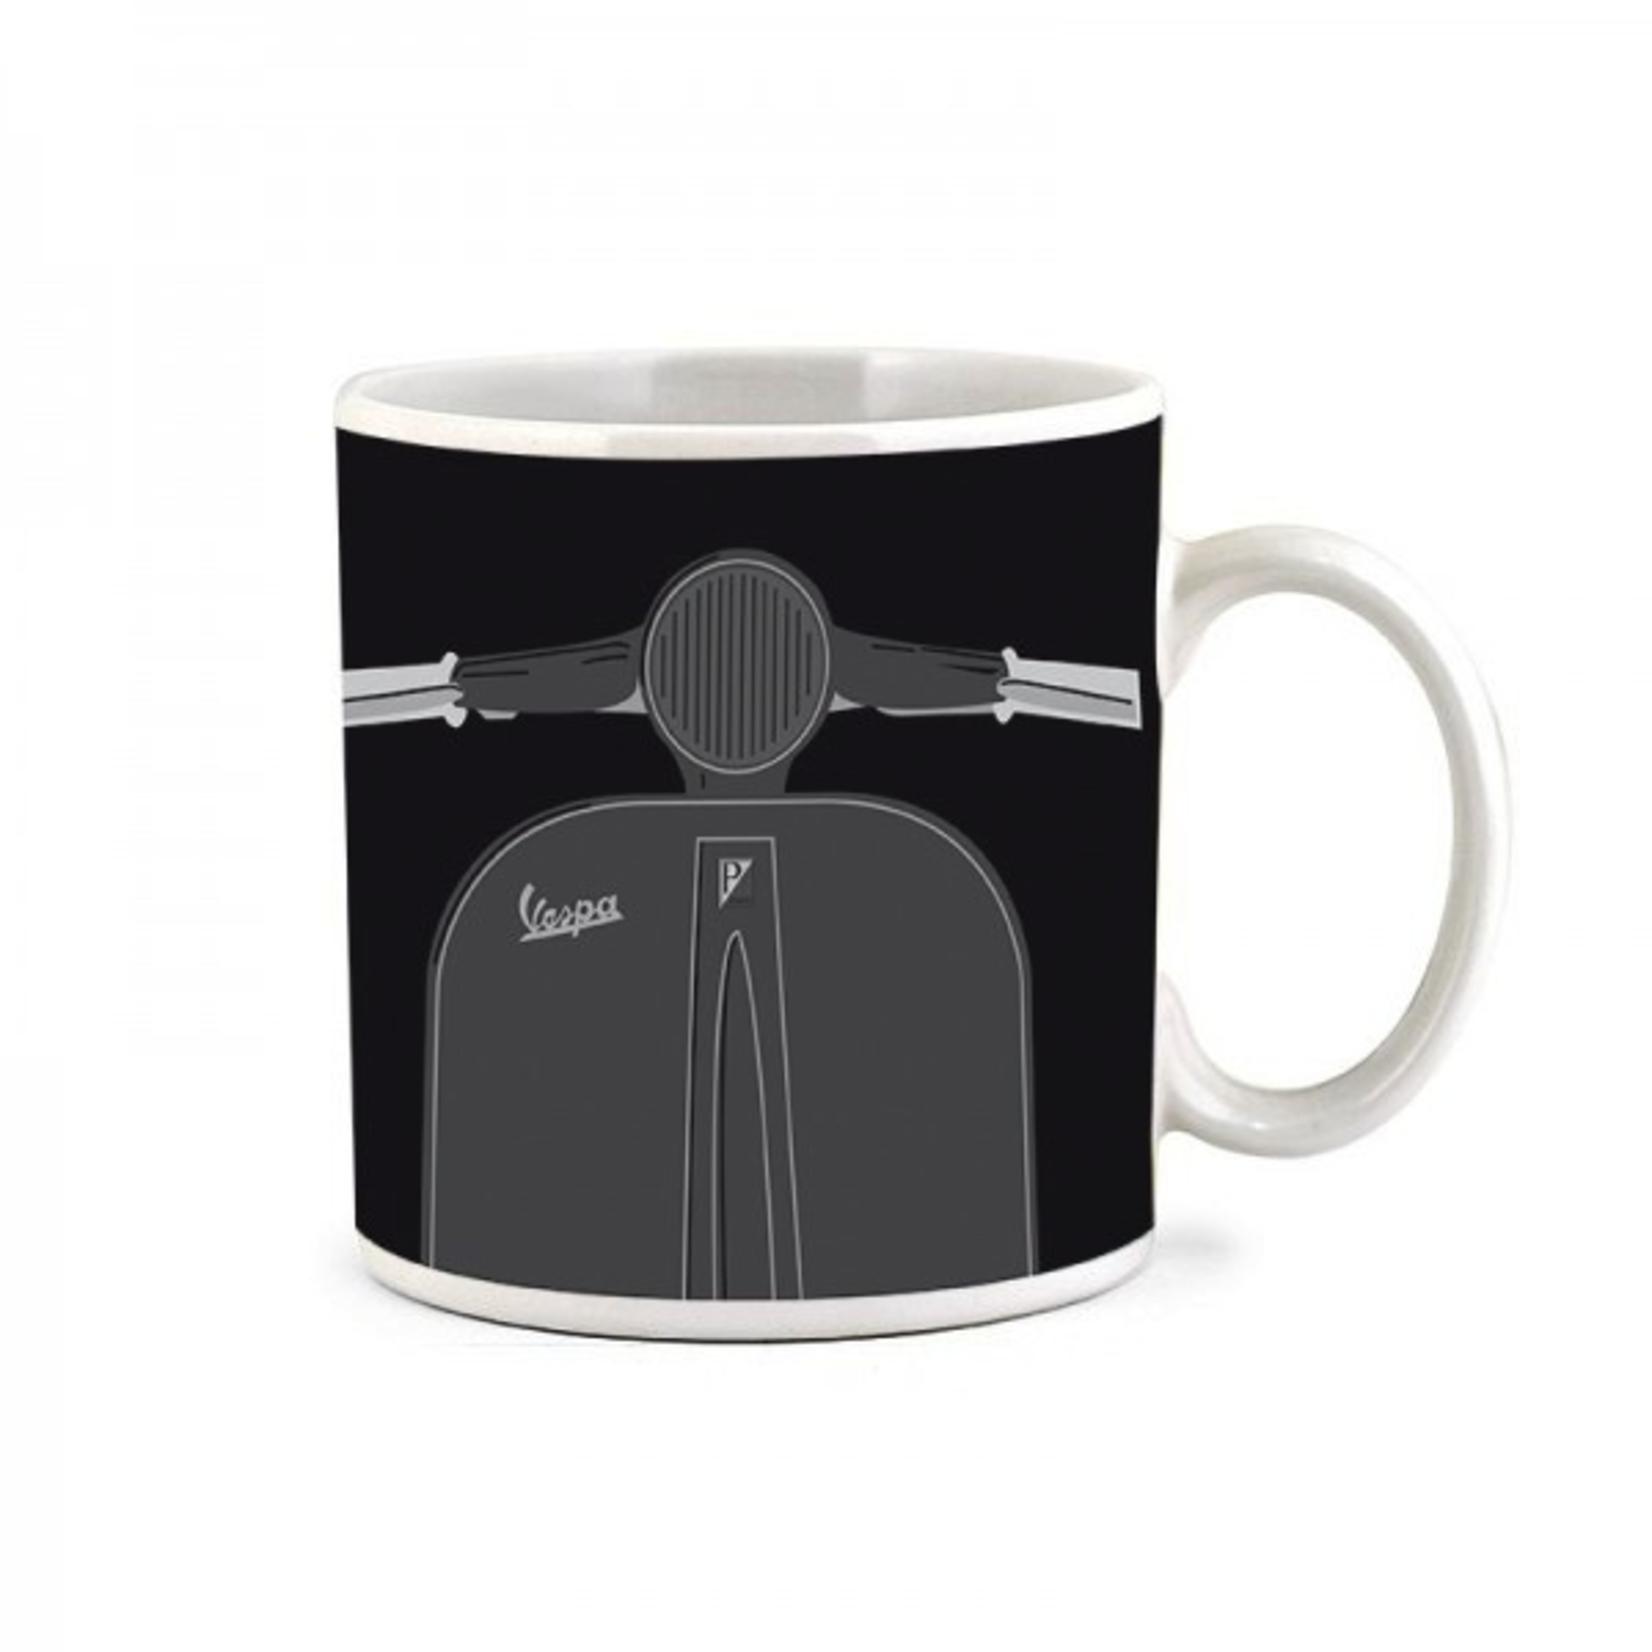 "Lifestyle Mug, ""GO Vespa"""